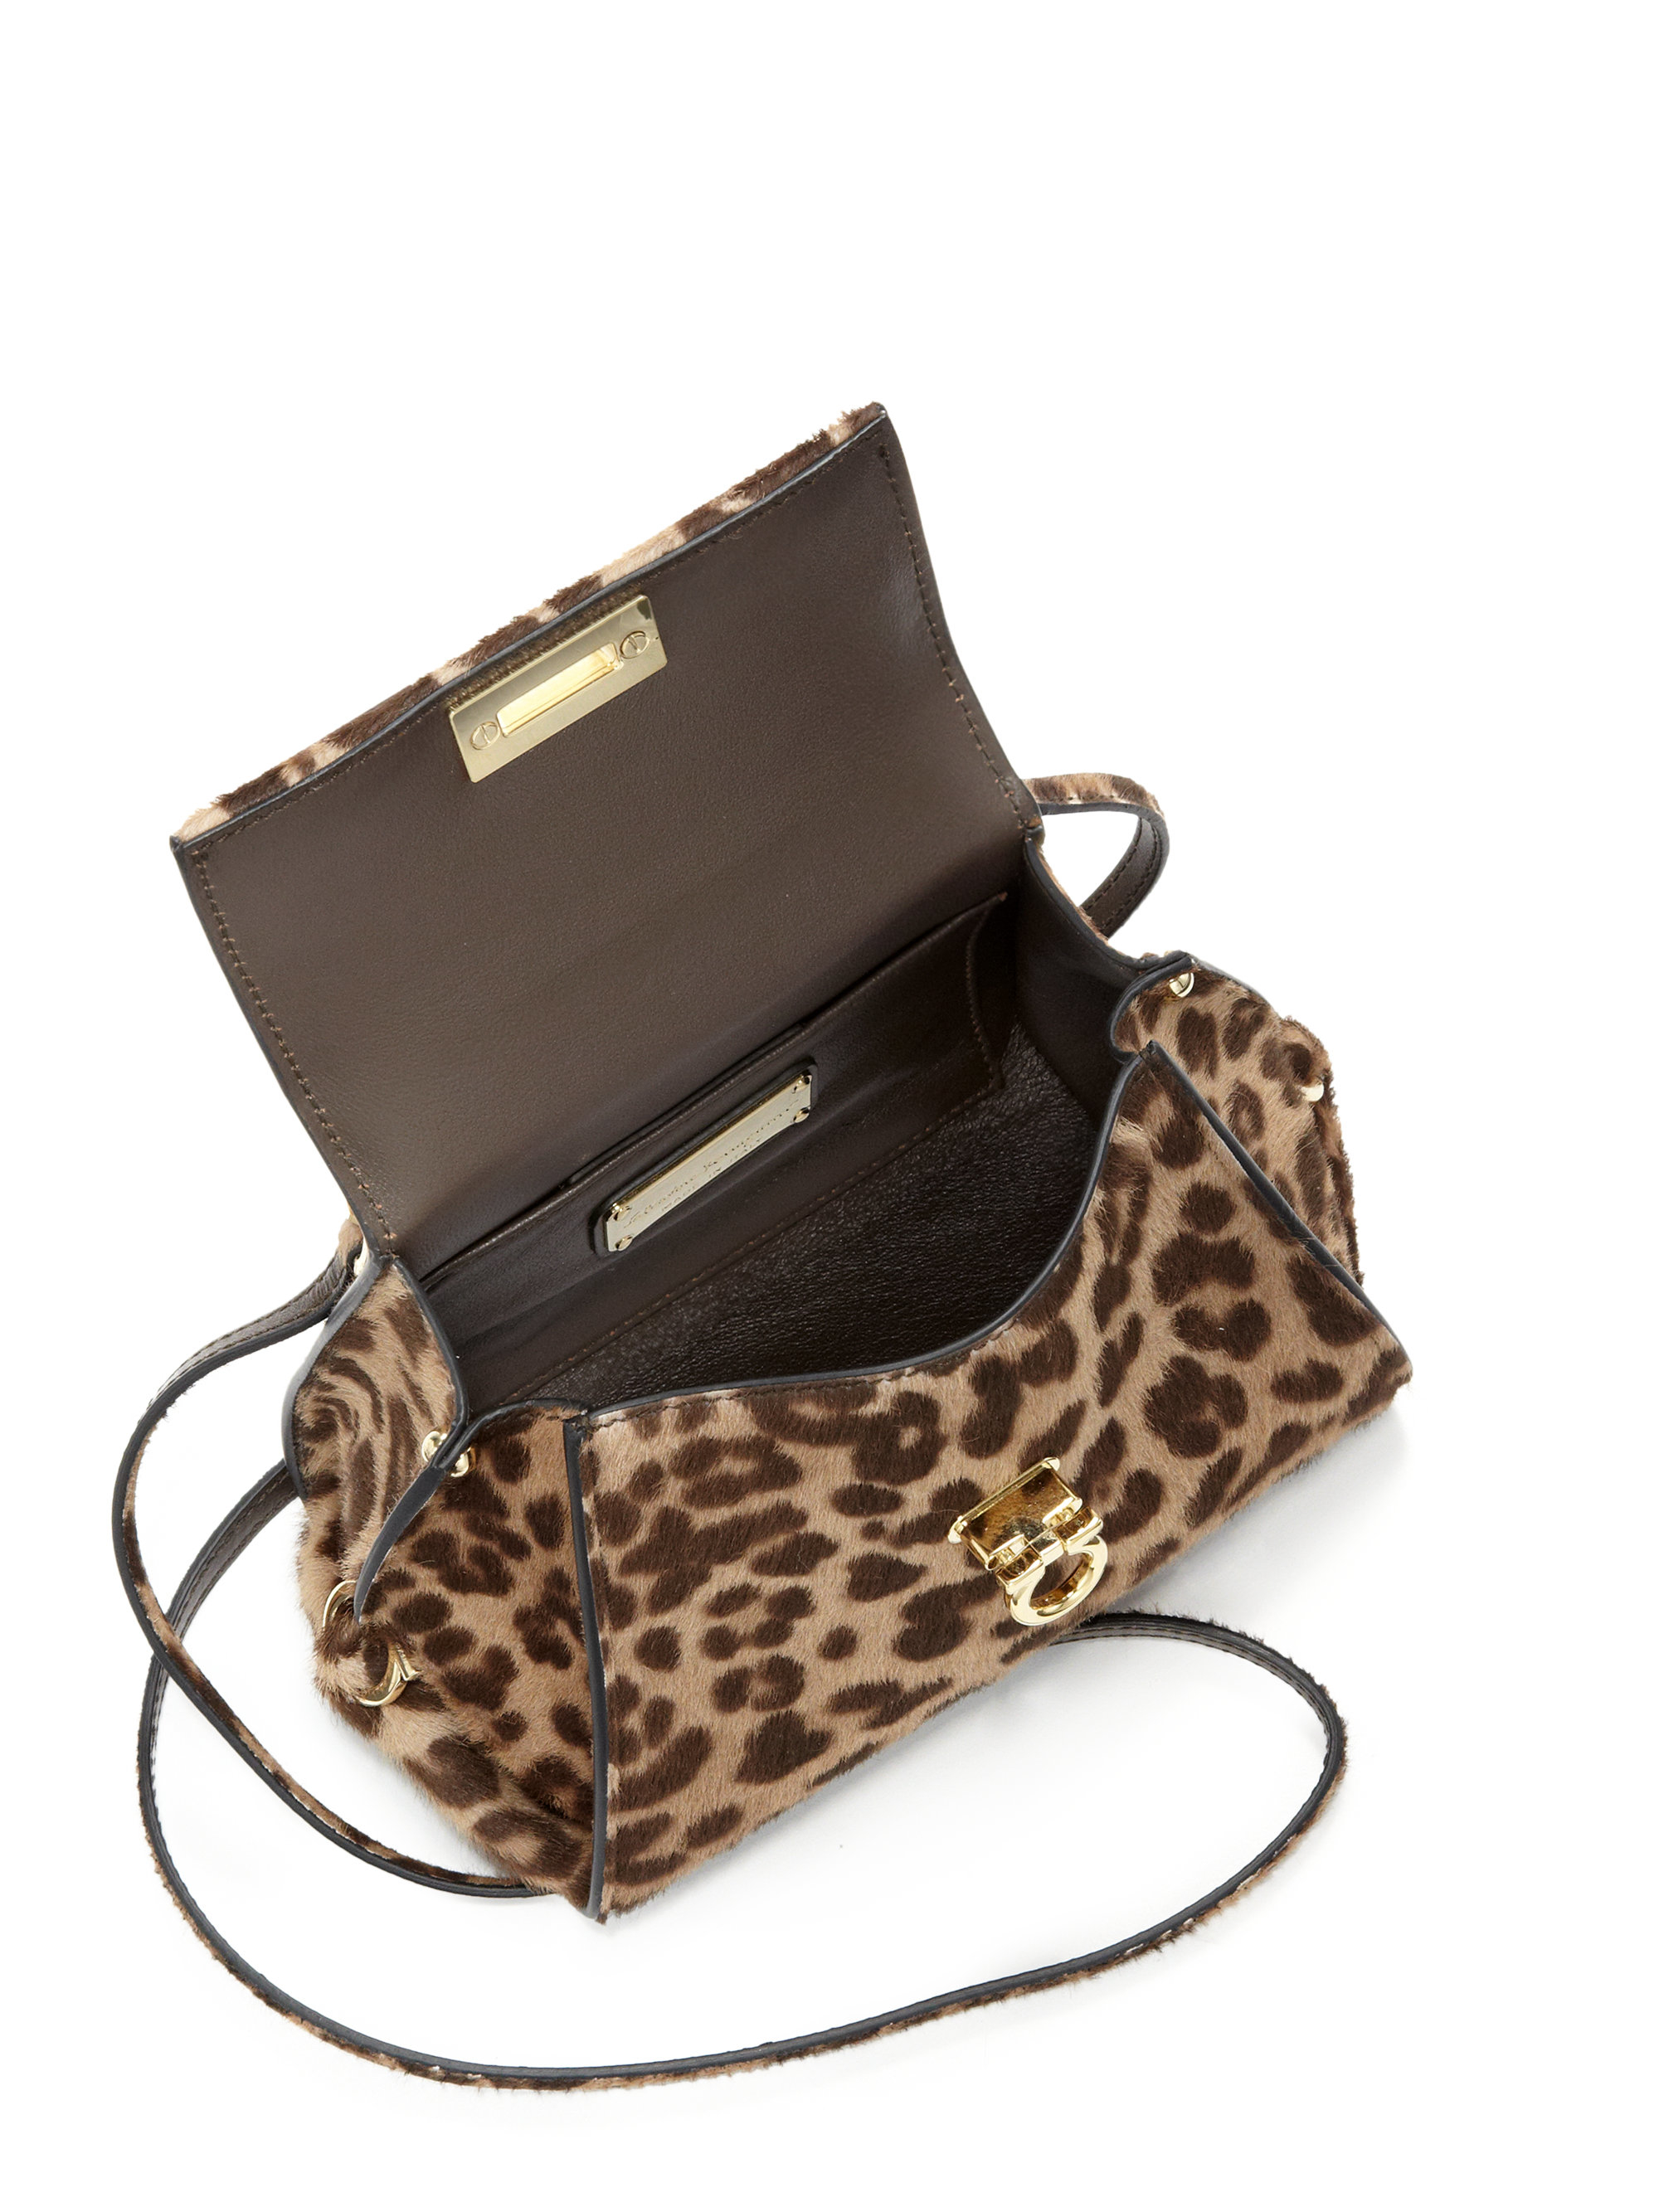 5694e732742f Ferragamo Sofia Leopard-print Calf Hair Satchel - Lyst